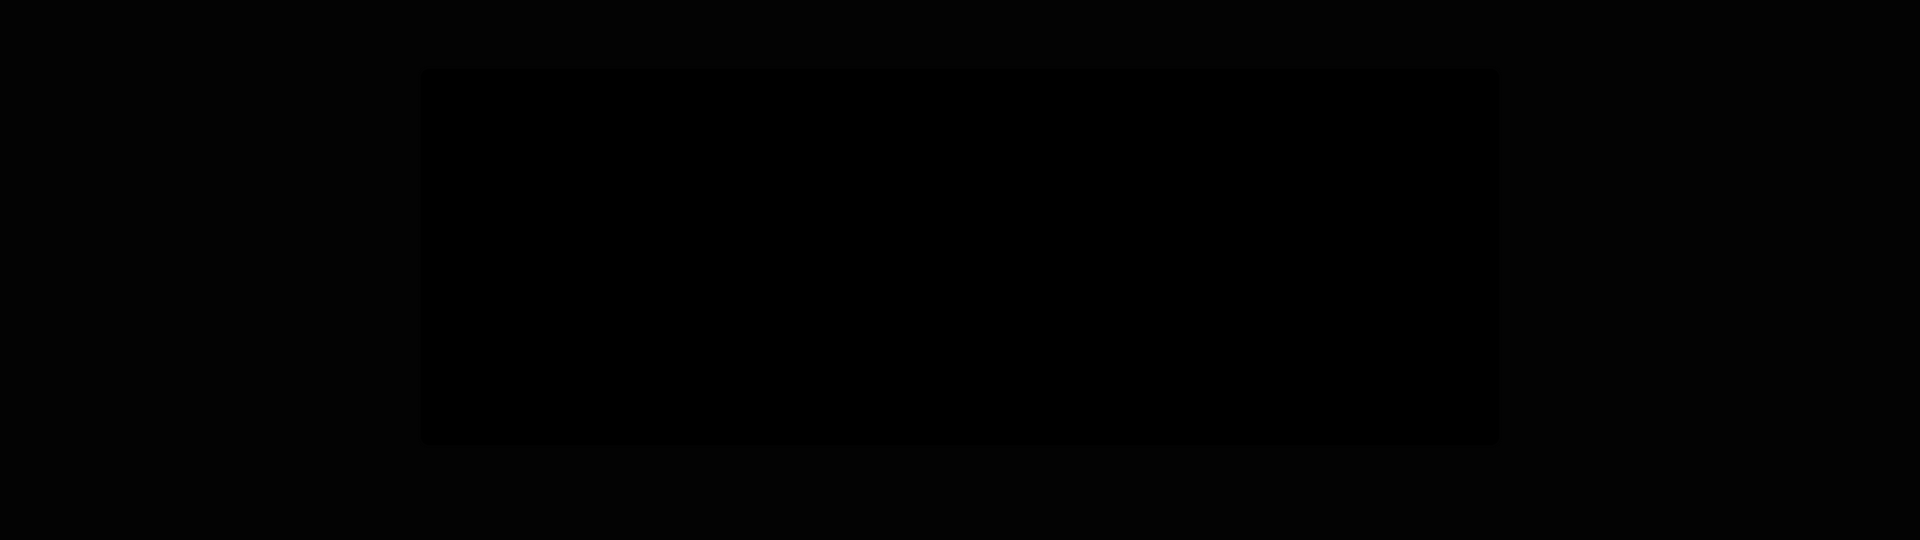 CATEGORY-SDA-DYSONTEKNOLOJIKESFET-BP-10-08